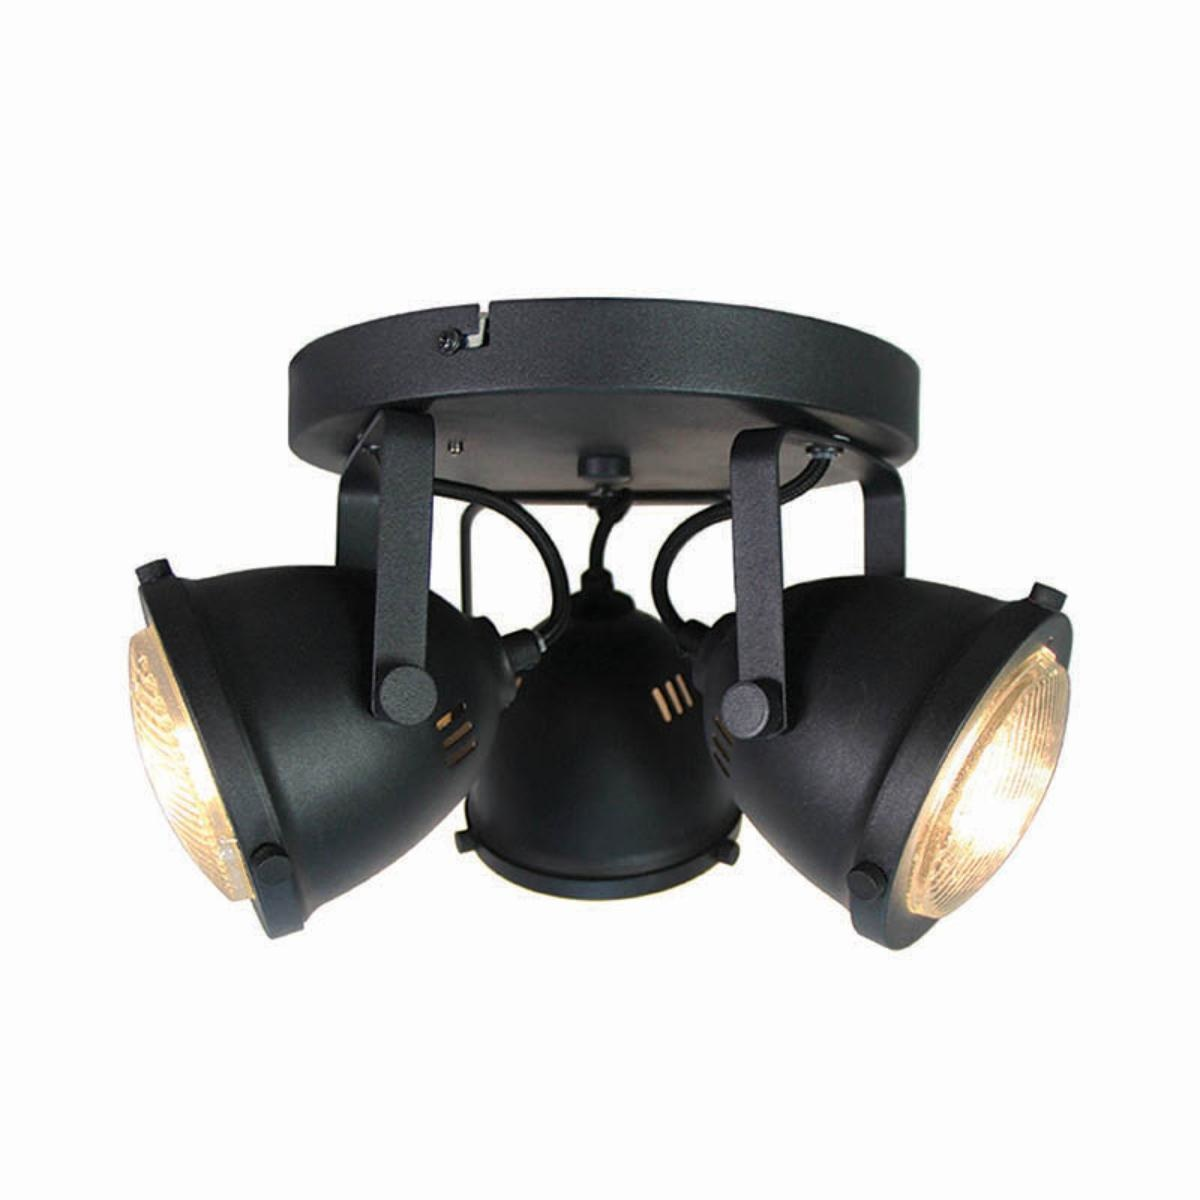 Spot Moto led - Zwart - Metaal - 3 Lichts